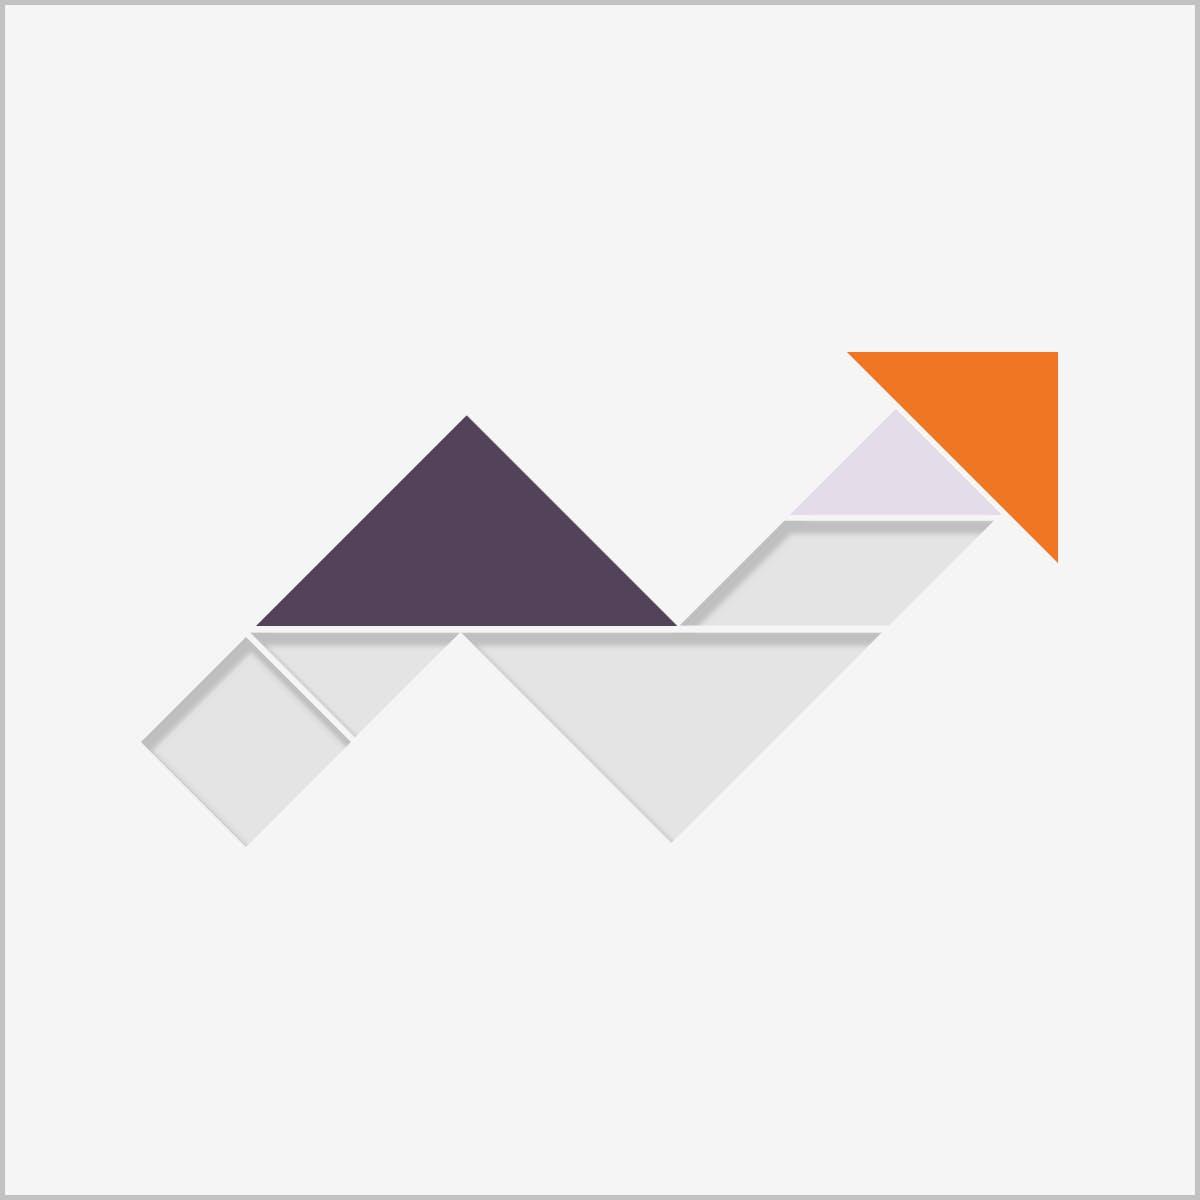 Firm Level Economics: Markets and Allocations